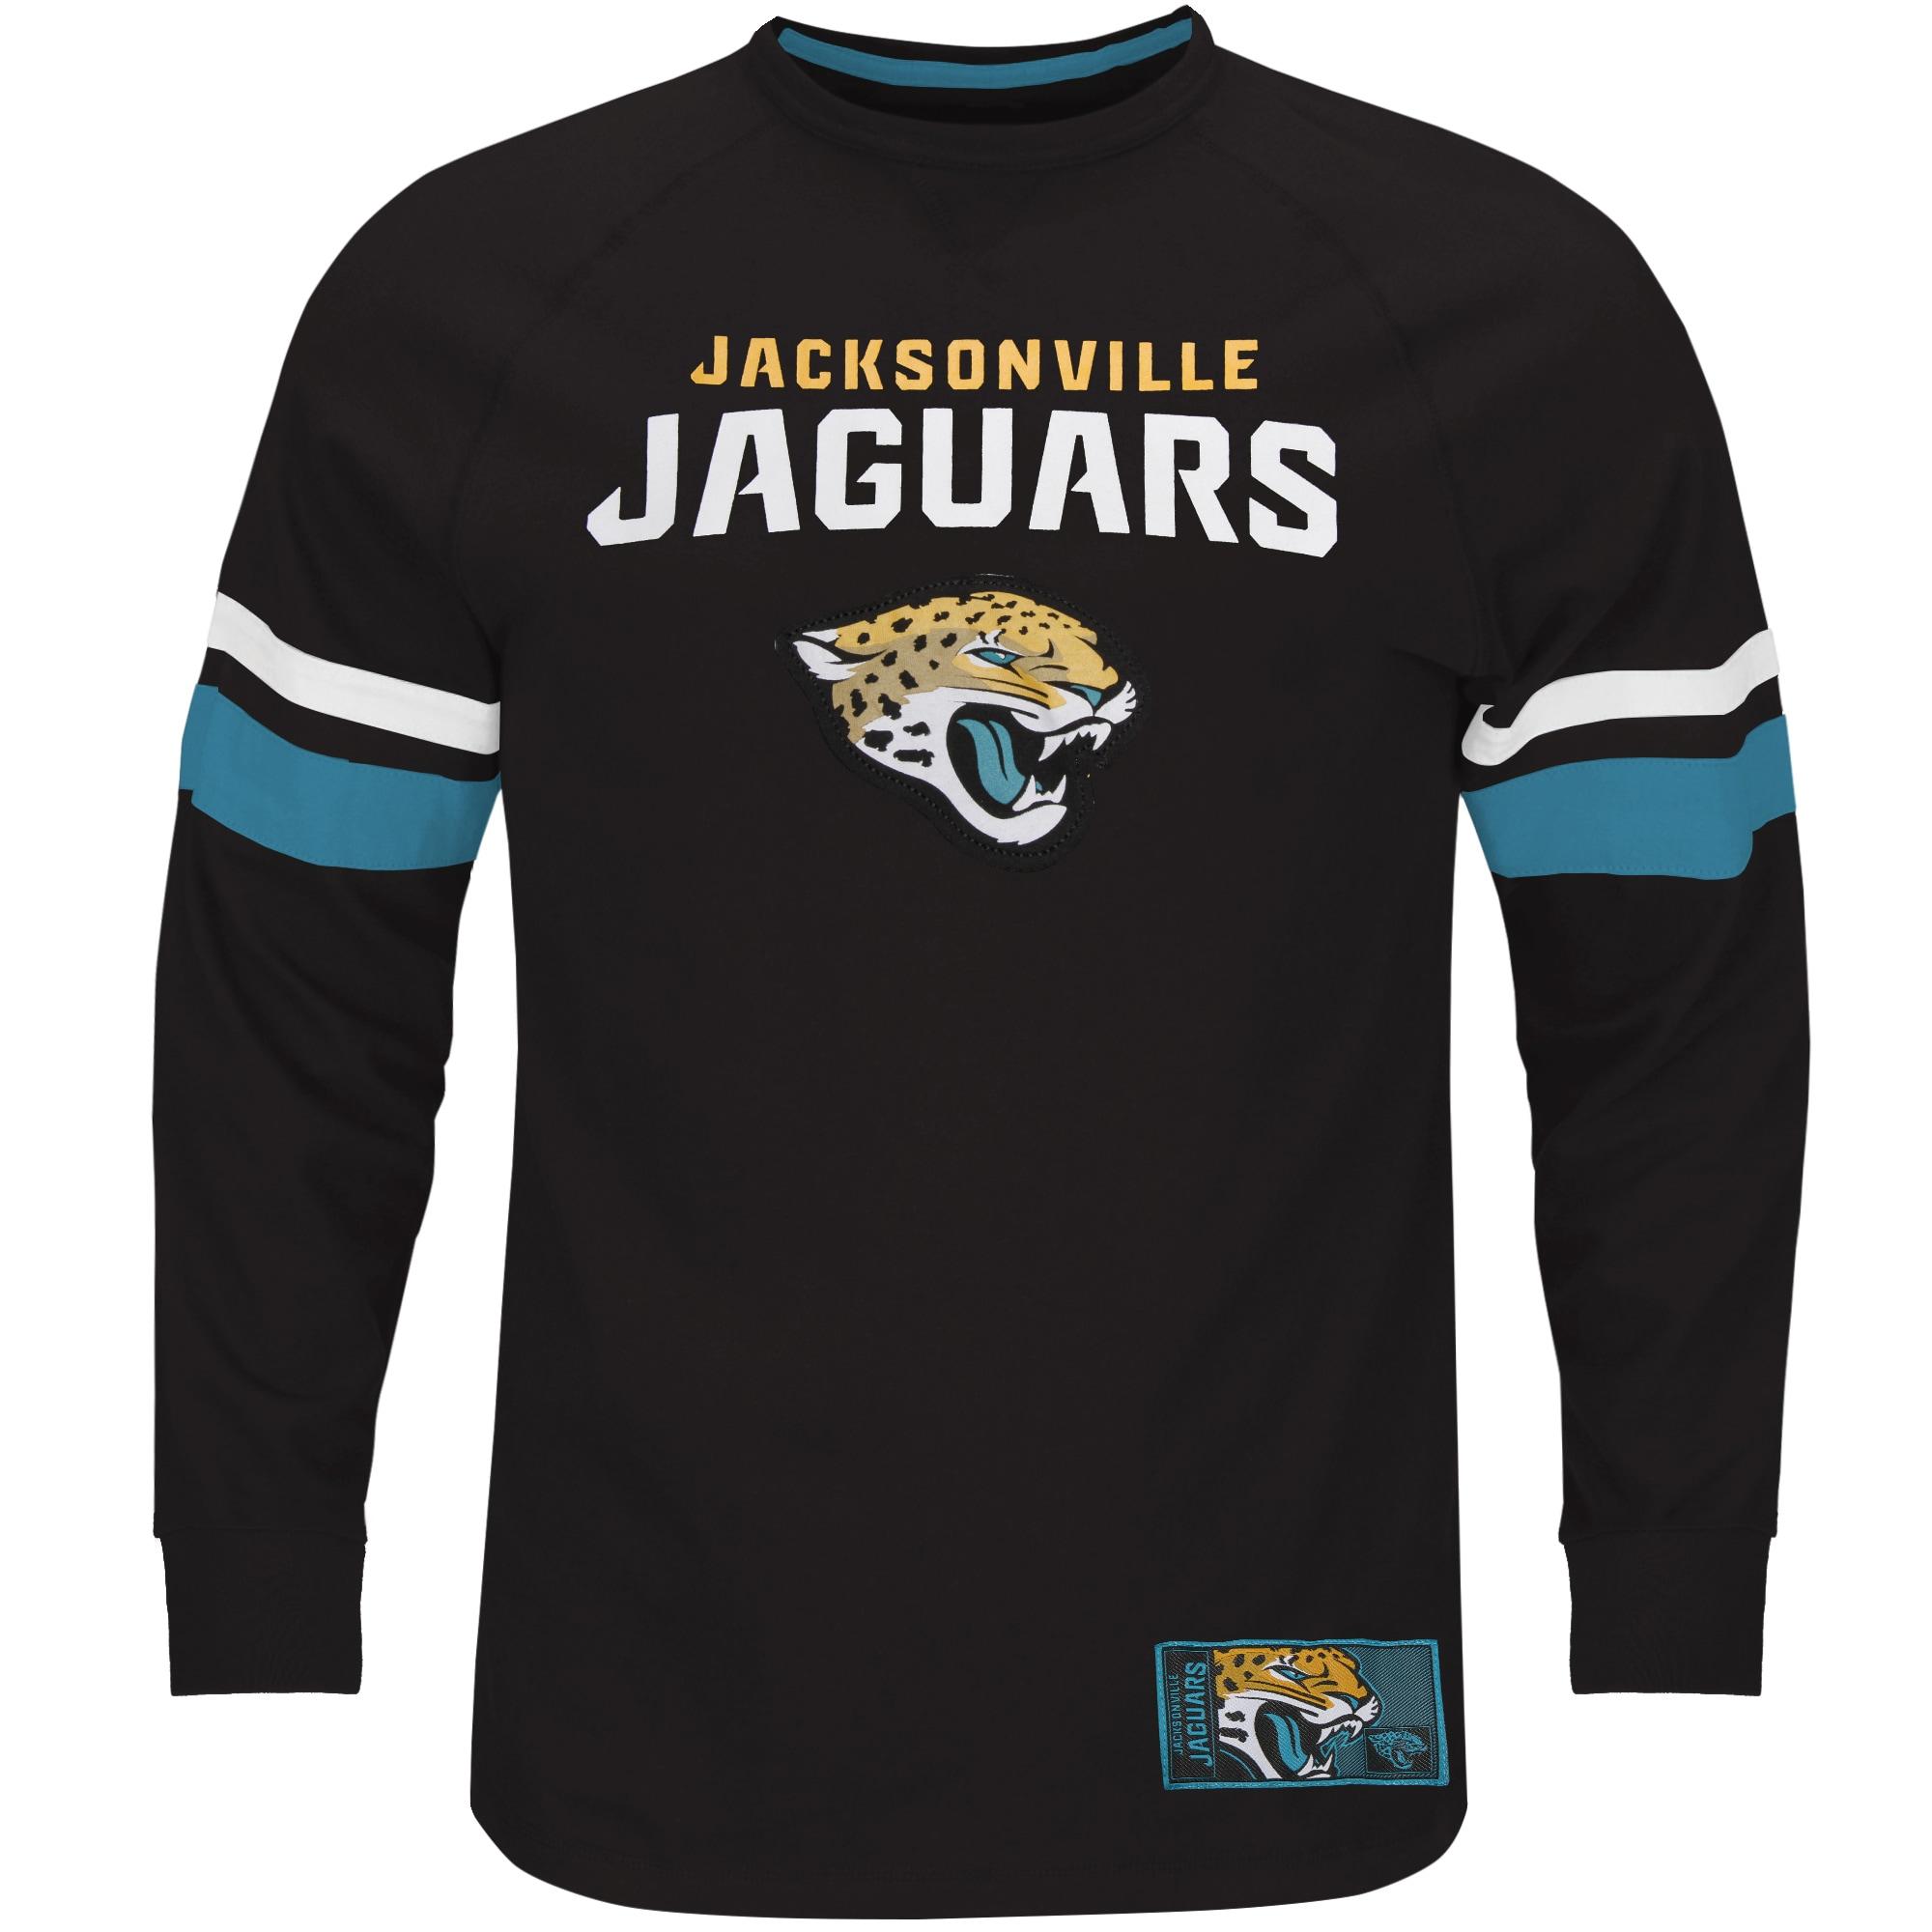 Jacksonville Jaguars Majestic Big & Tall Power Hit Long Sleeve T-Shirt - Black